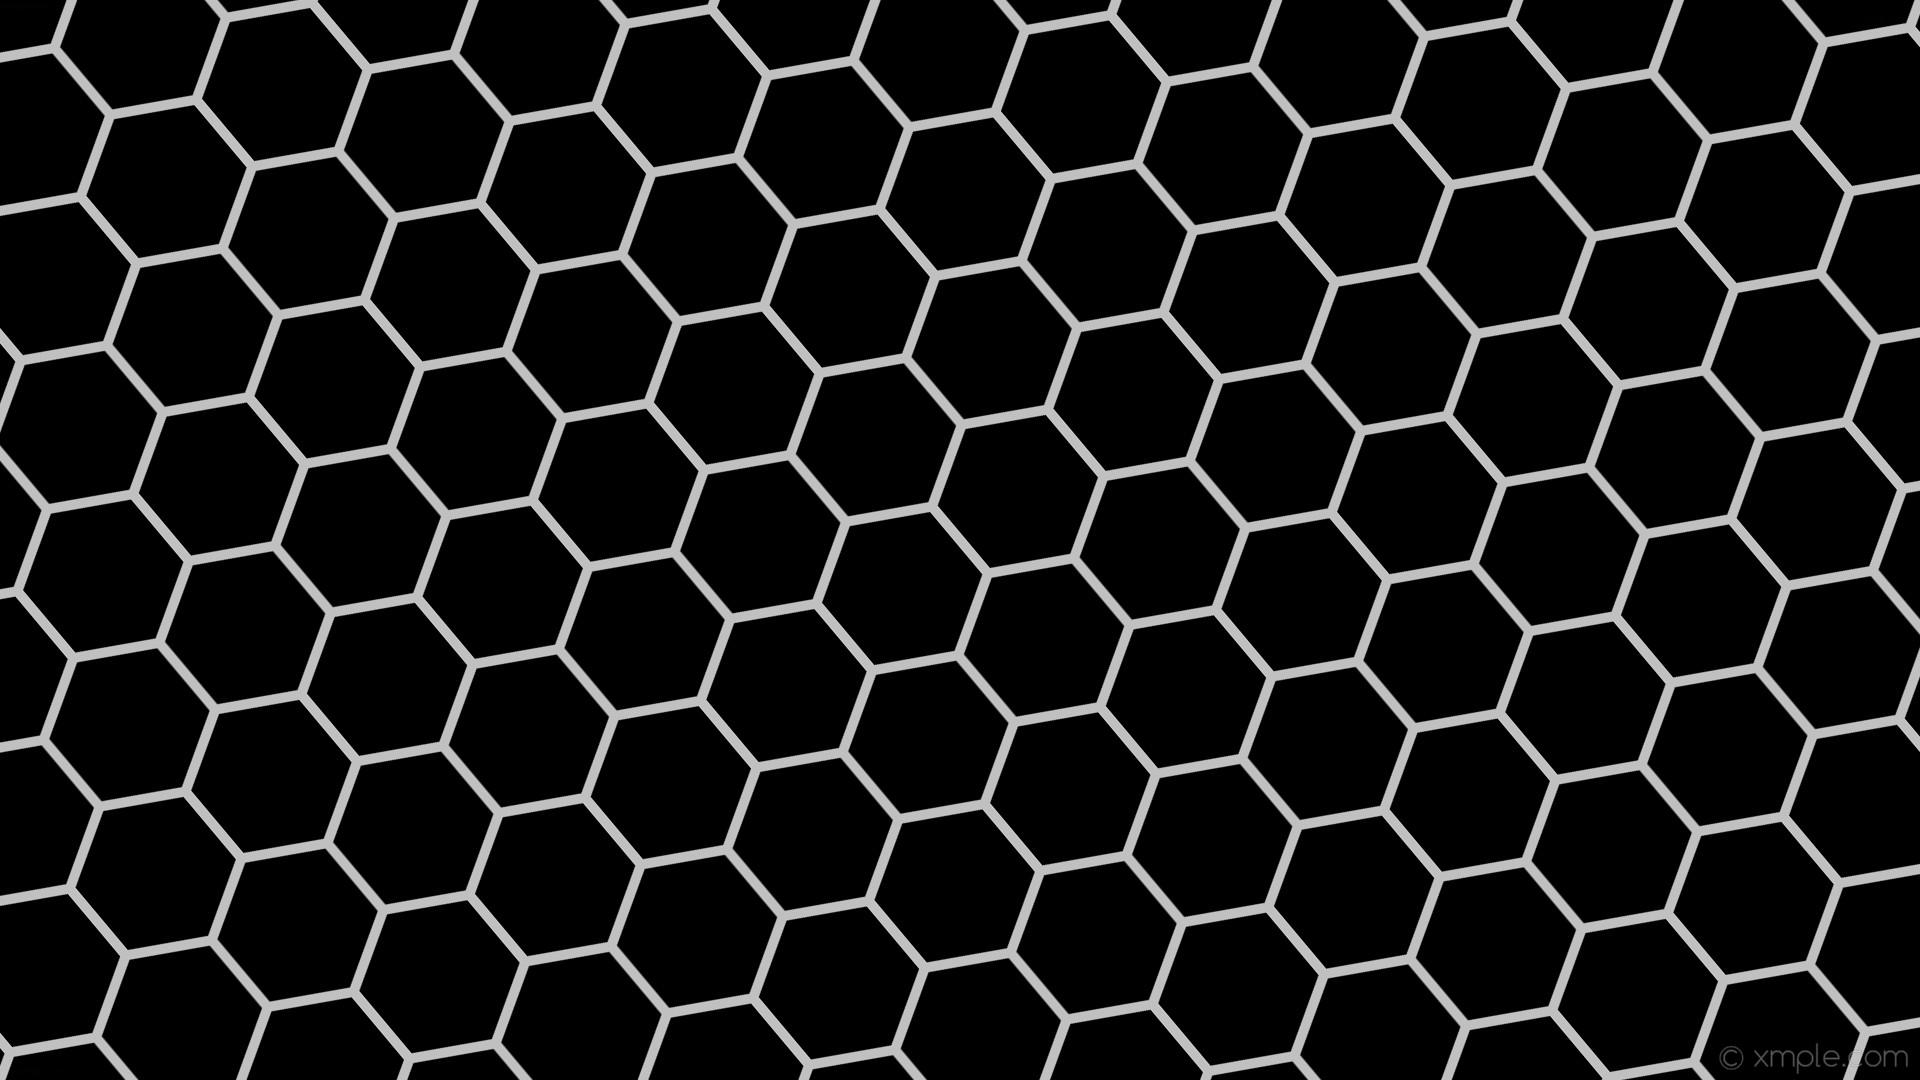 wallpaper beehive grey honeycomb hexagon black silver #000000 #c0c0c0  diagonal 40° 10px 151px